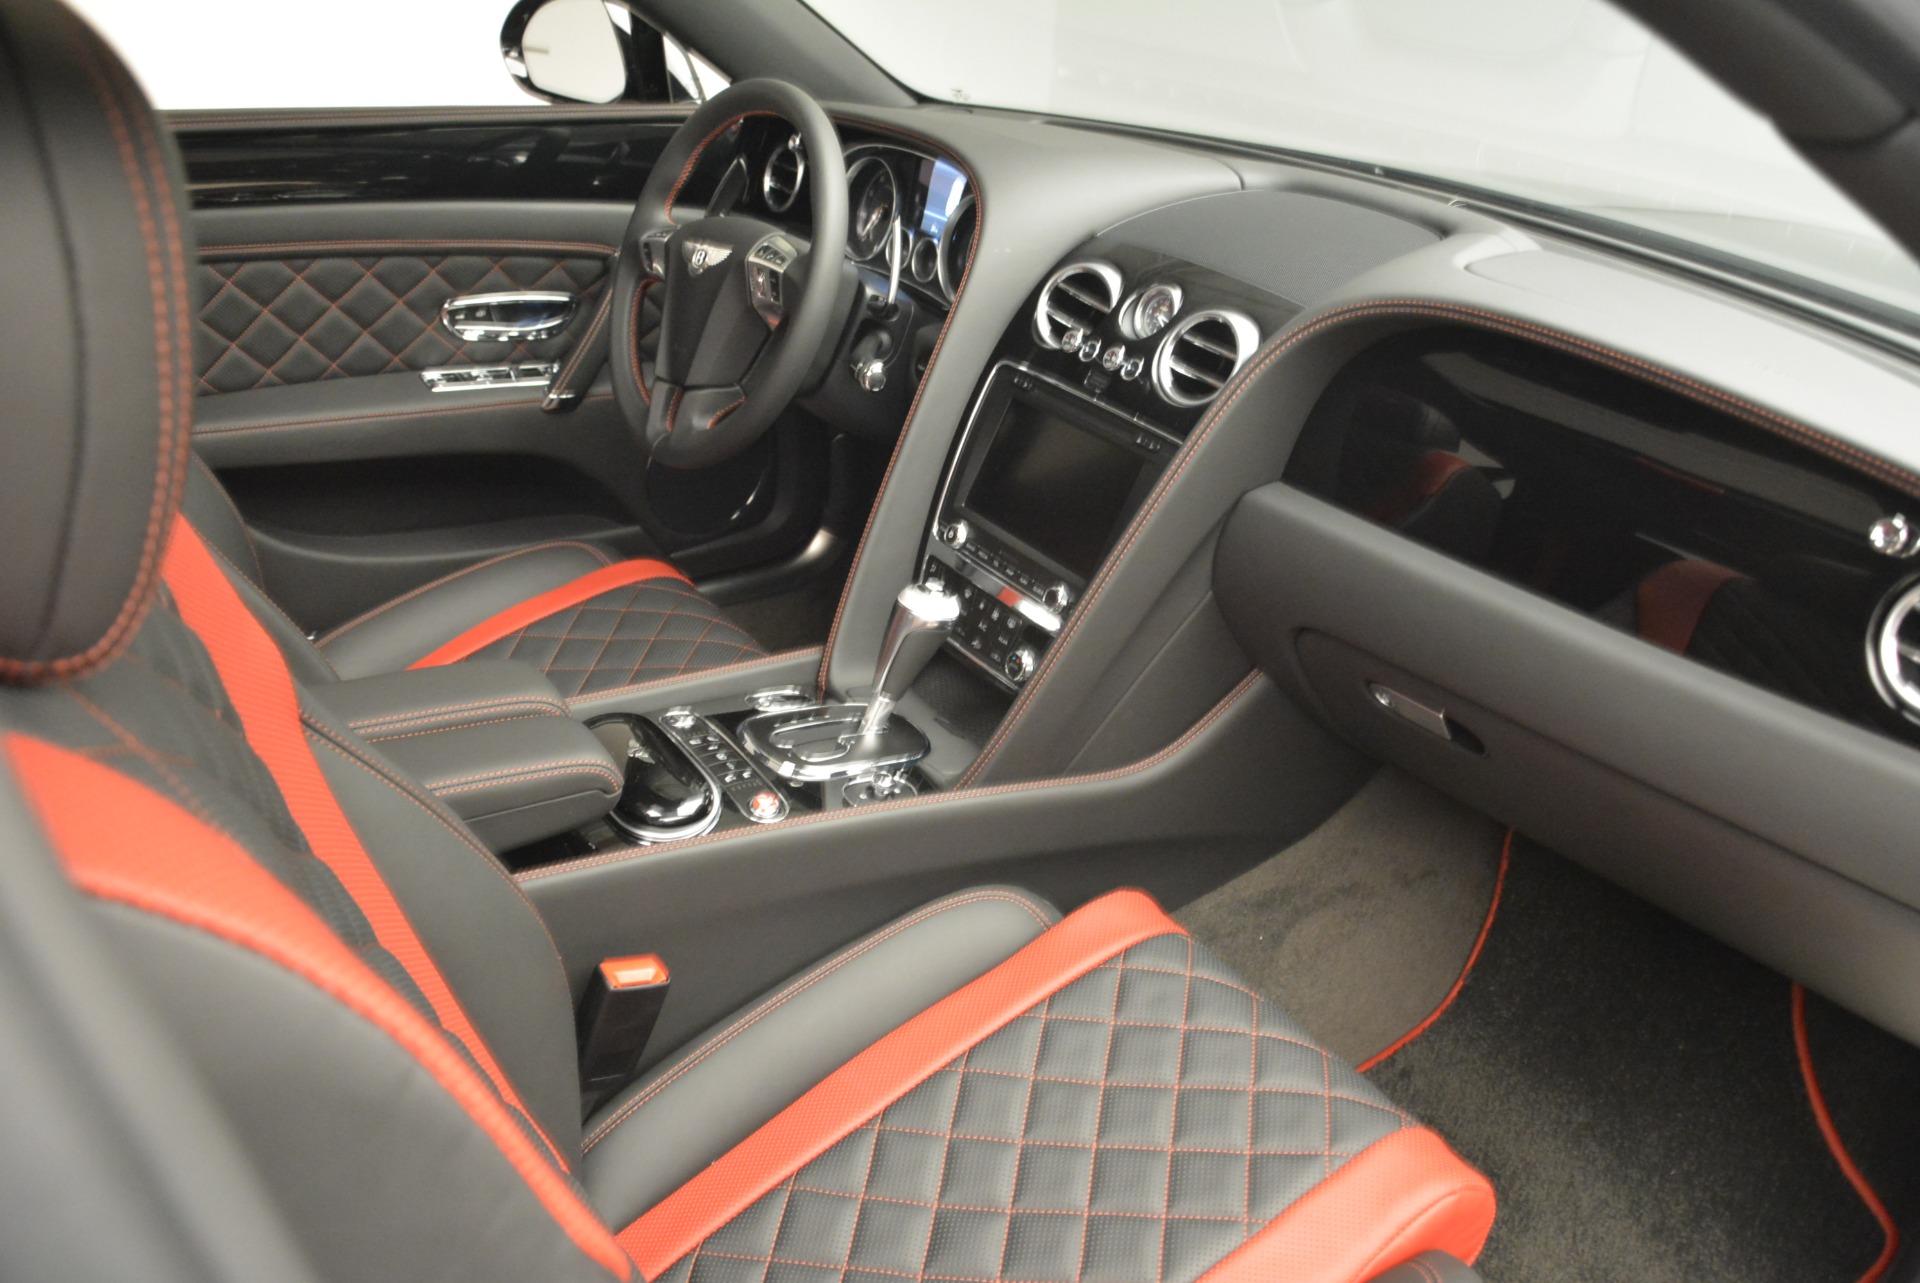 New 2018 Bentley Flying Spur V8 S Black Edition For Sale In Westport, CT 2073_p20